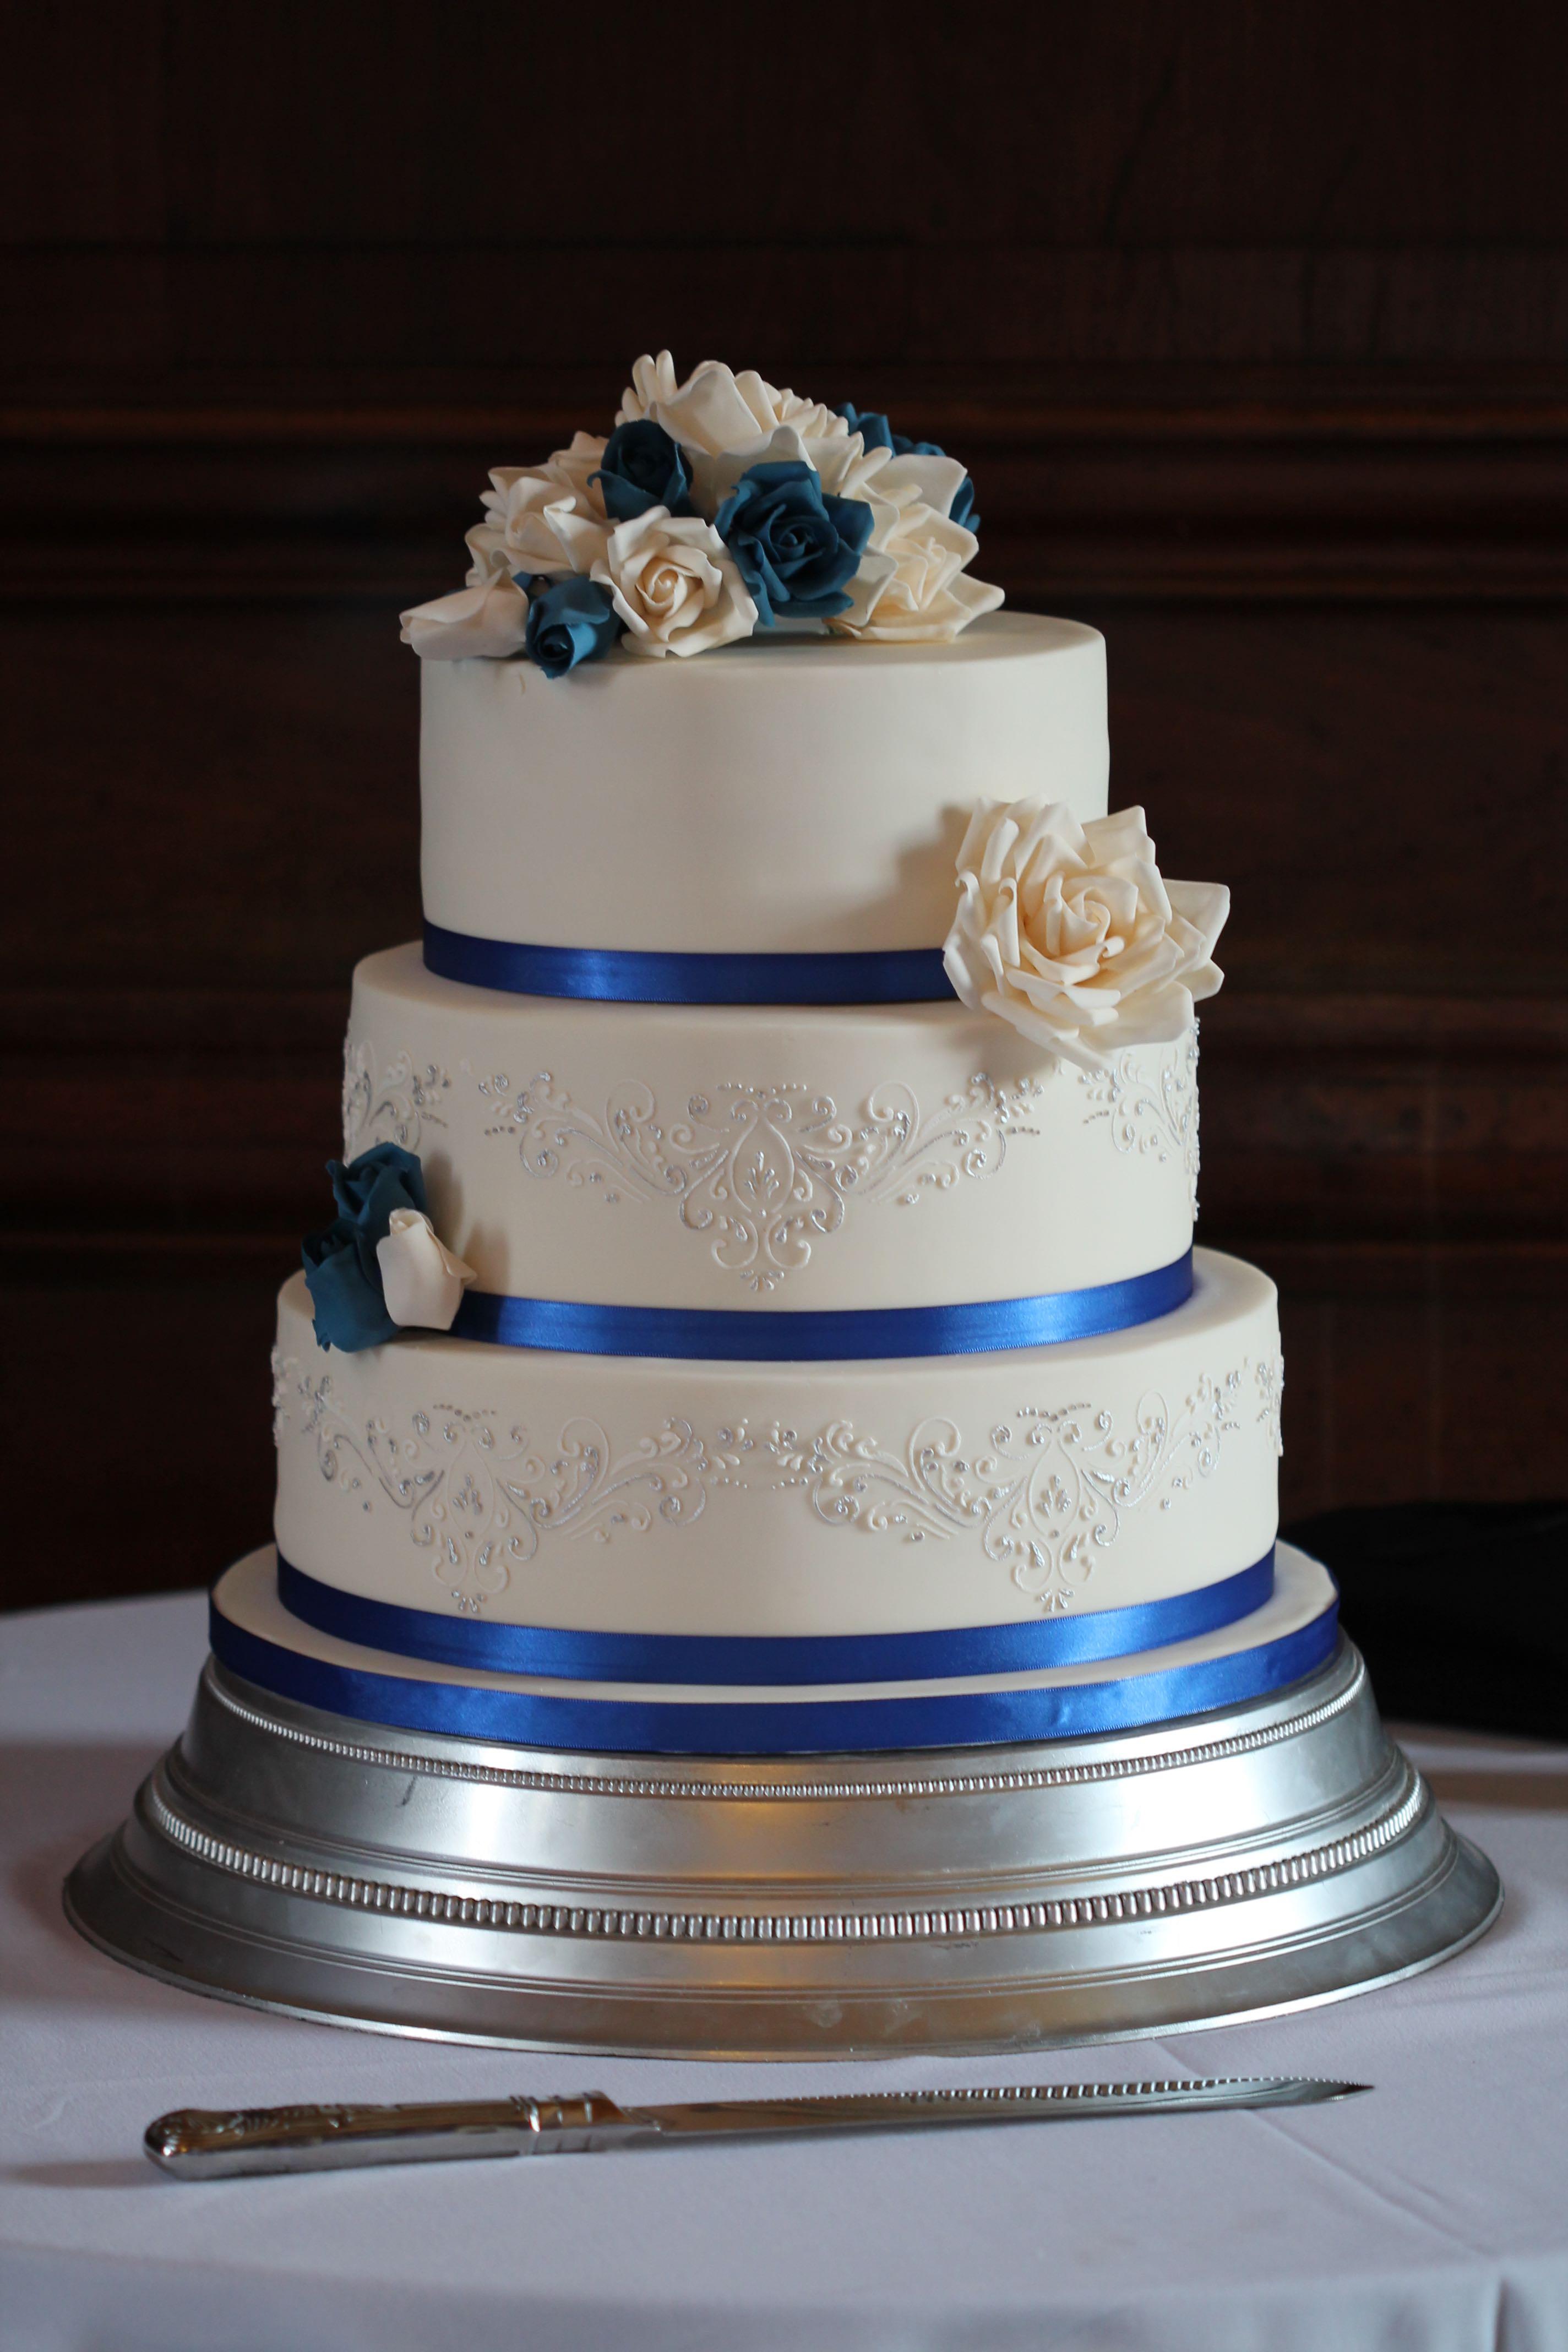 royal blue and silver wedding cakes - Wedding Cake Design Ideas